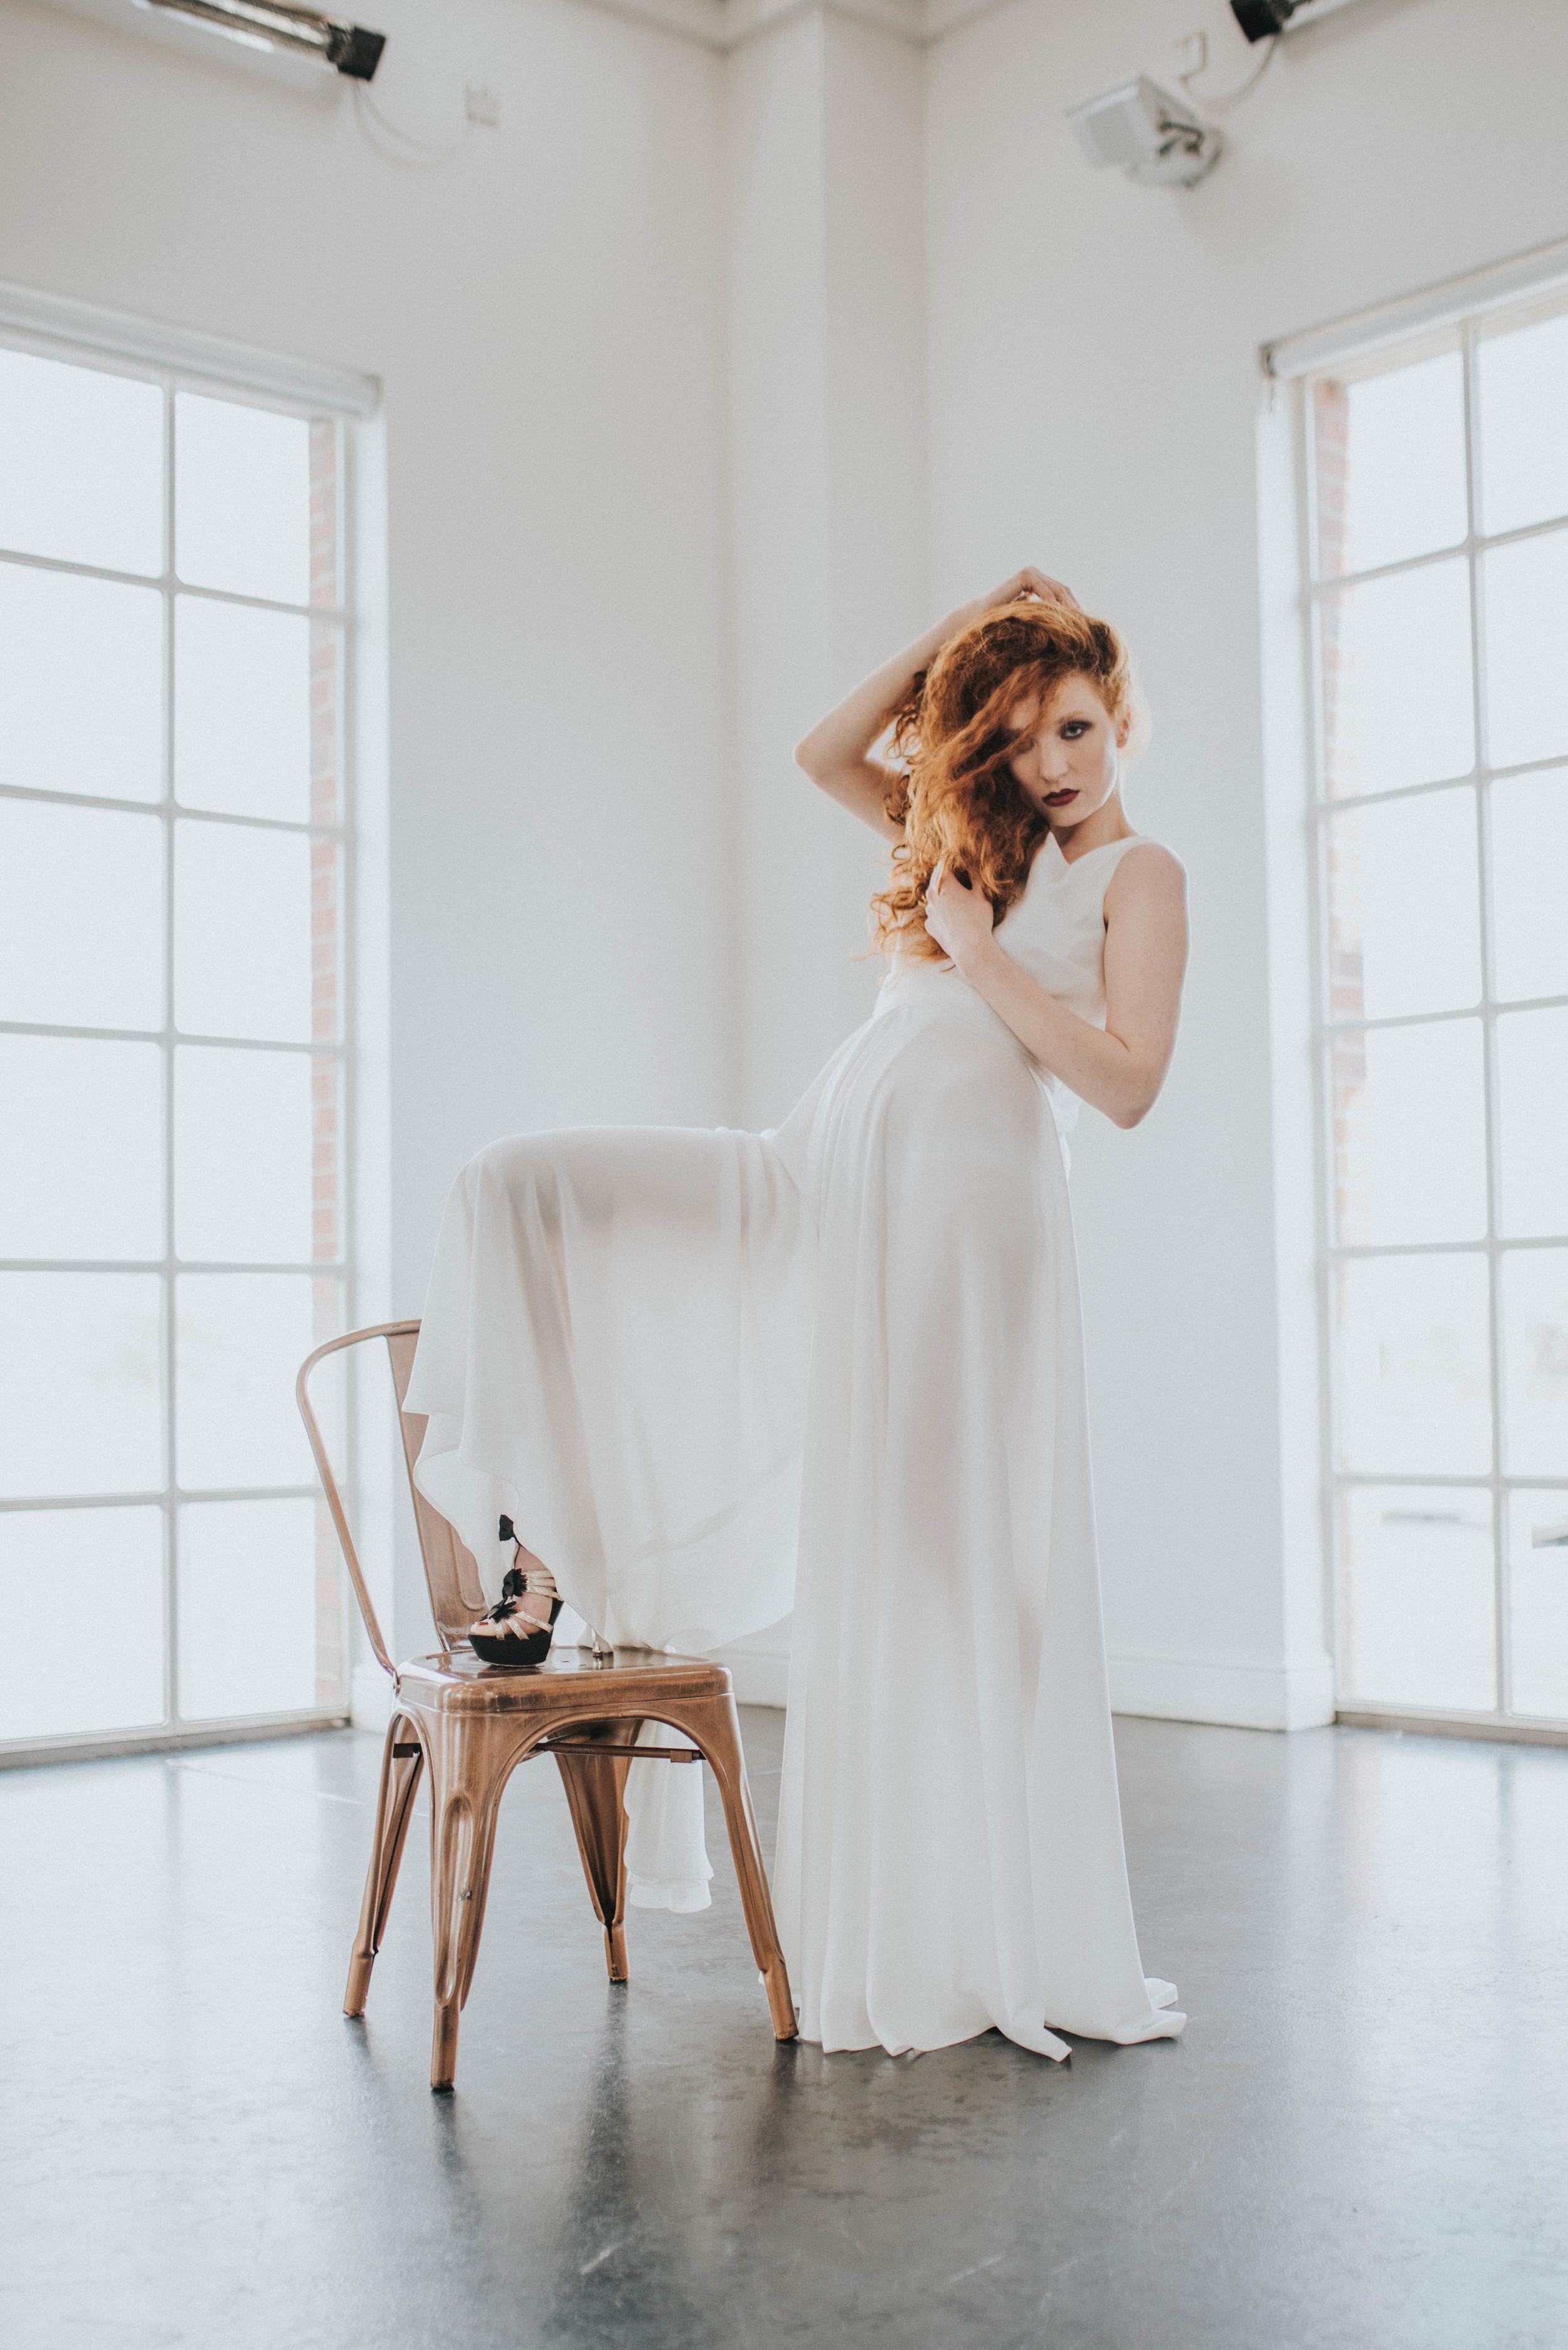 CrystalChic_WeddingInspiration-140 copy.jpg